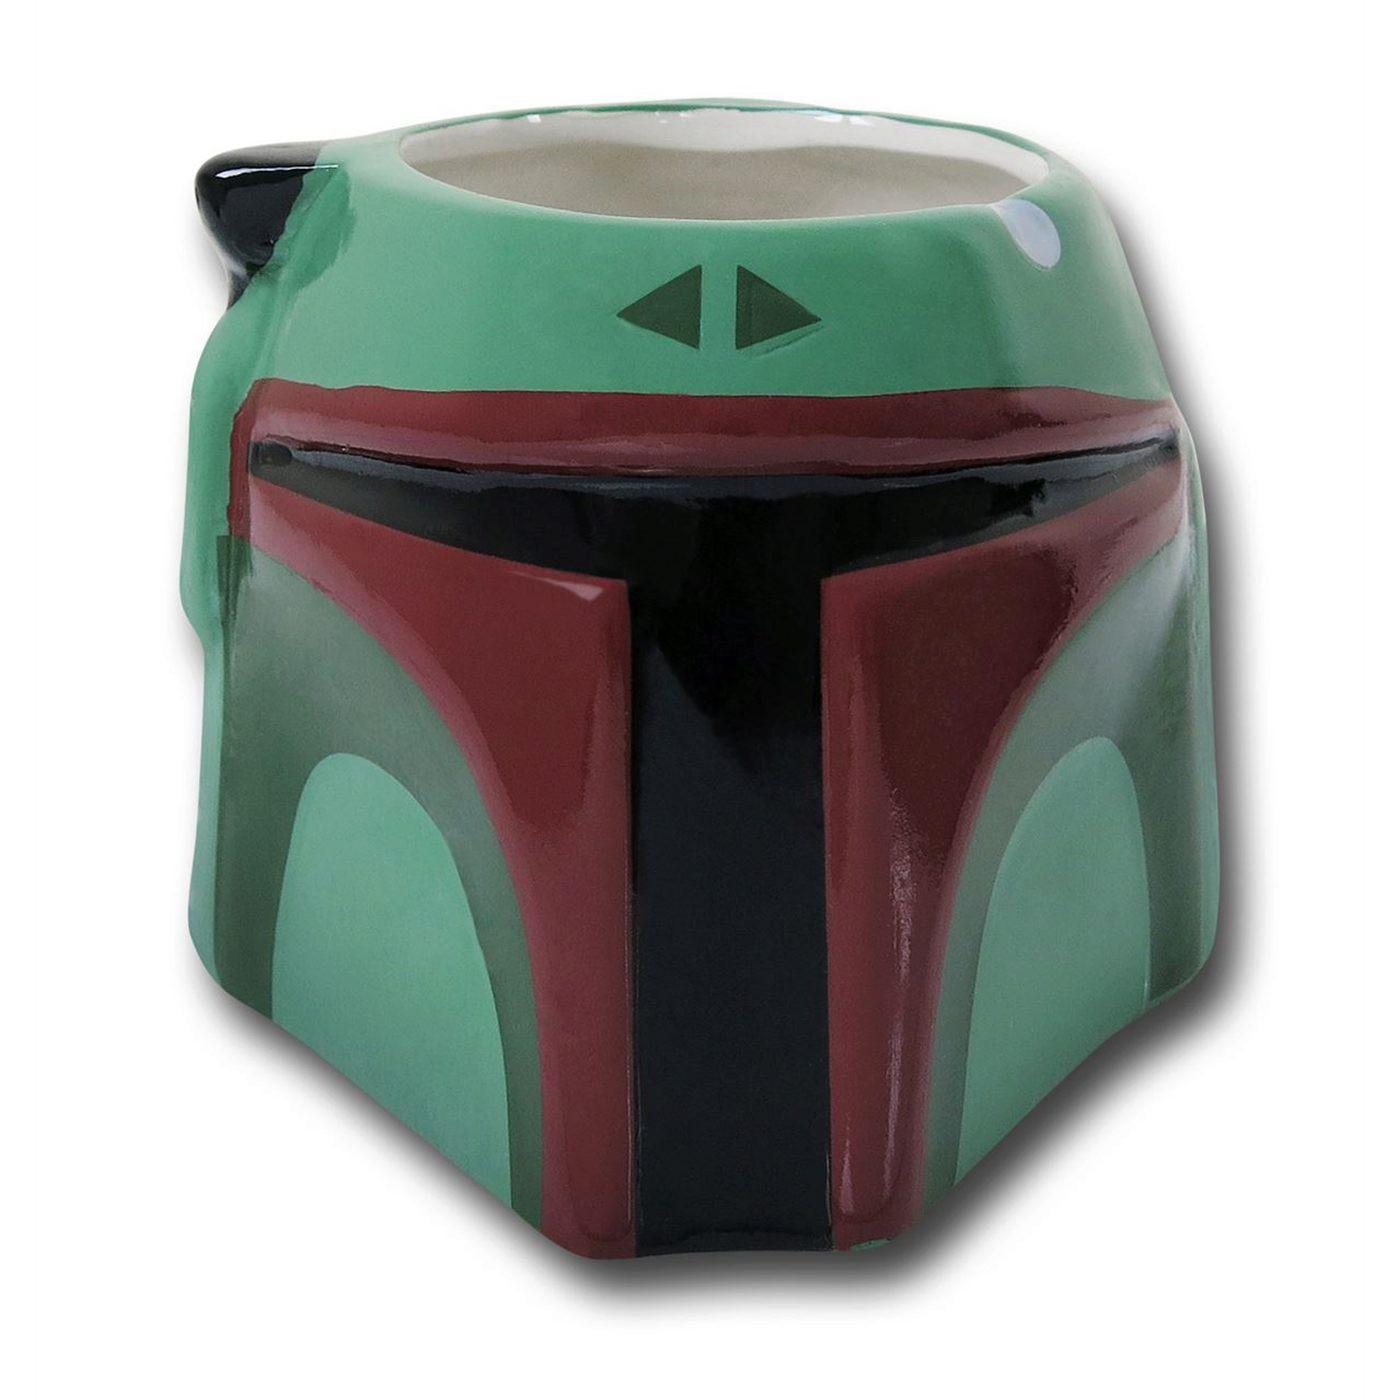 Star Wars Boba Fett Character 16.5 oz Mug